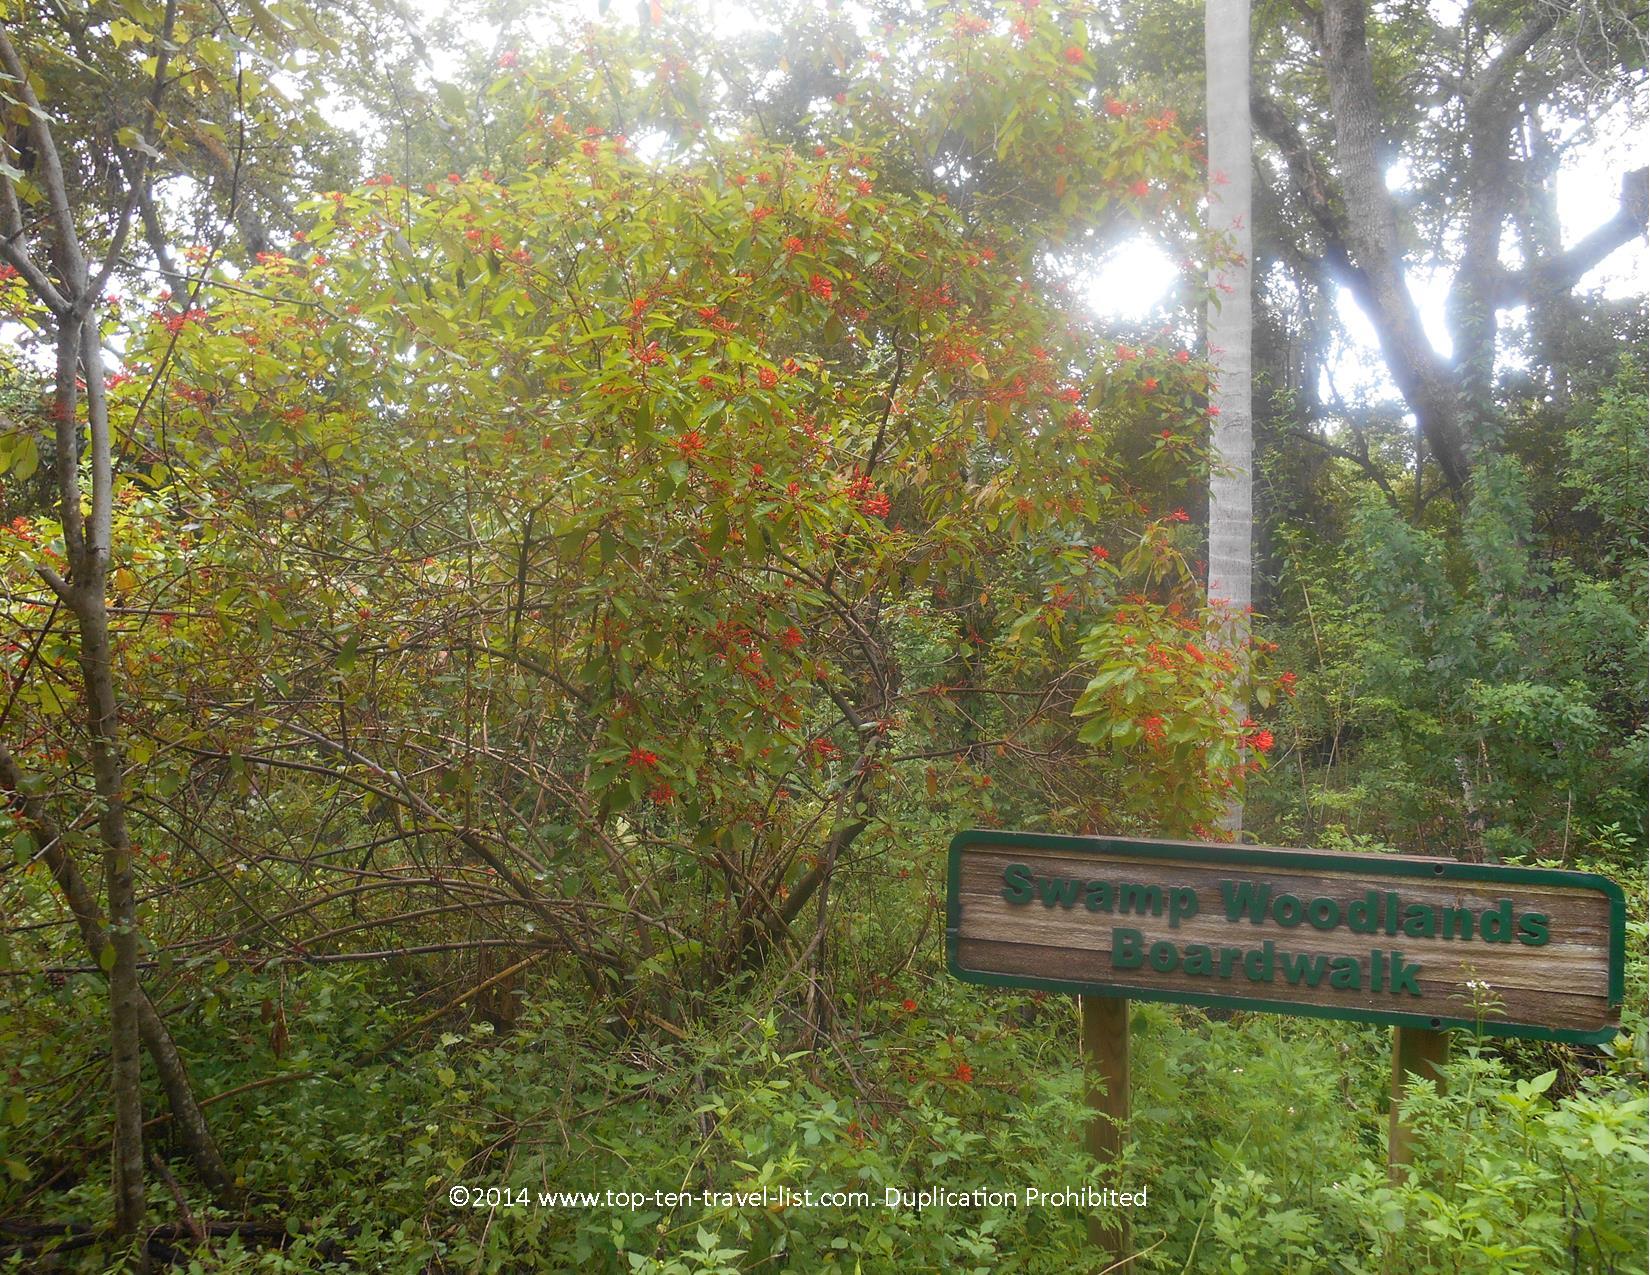 Swamp Woodlands Boardwalk at Boyd Hill Nature Preserve in St. Petersburg, Florida